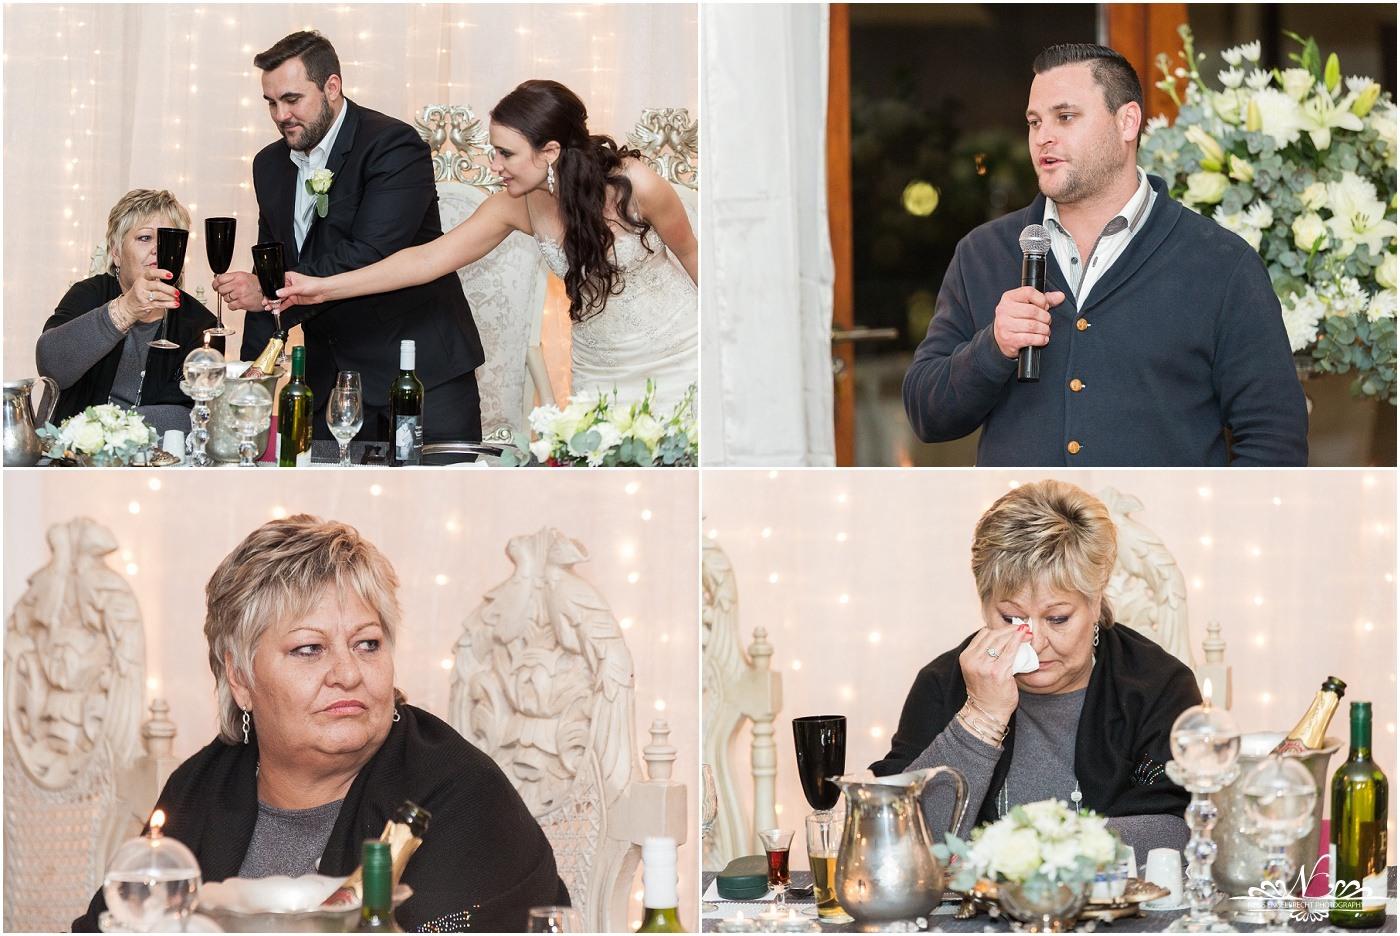 Eensgezind-Wedding-Photos-Nelis-Engelbrecht-Photography-179